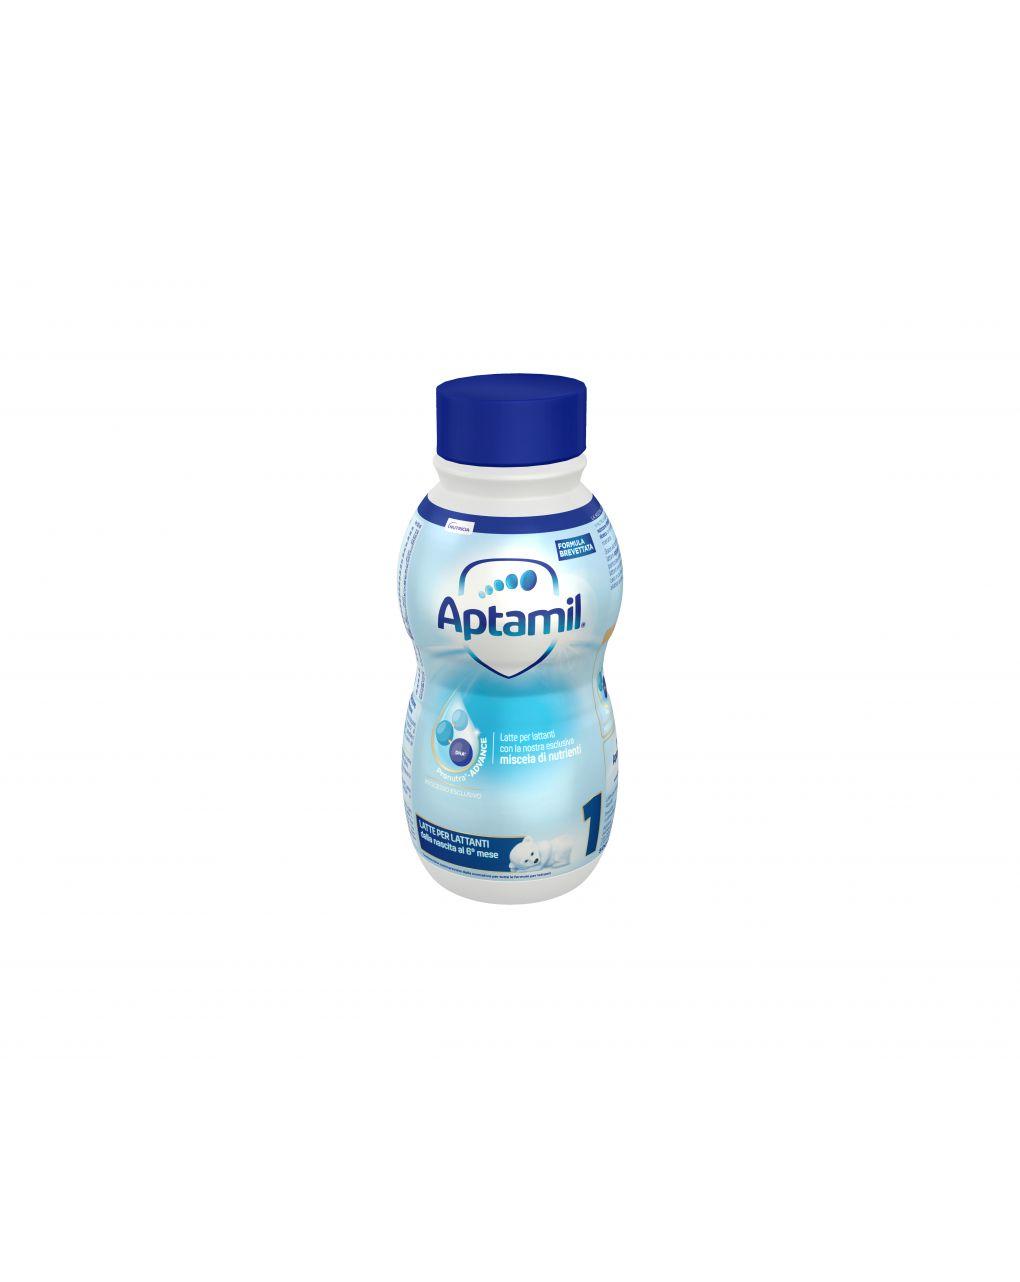 Aptamil - latte aptamil 1 liquido 500ml - Aptamil